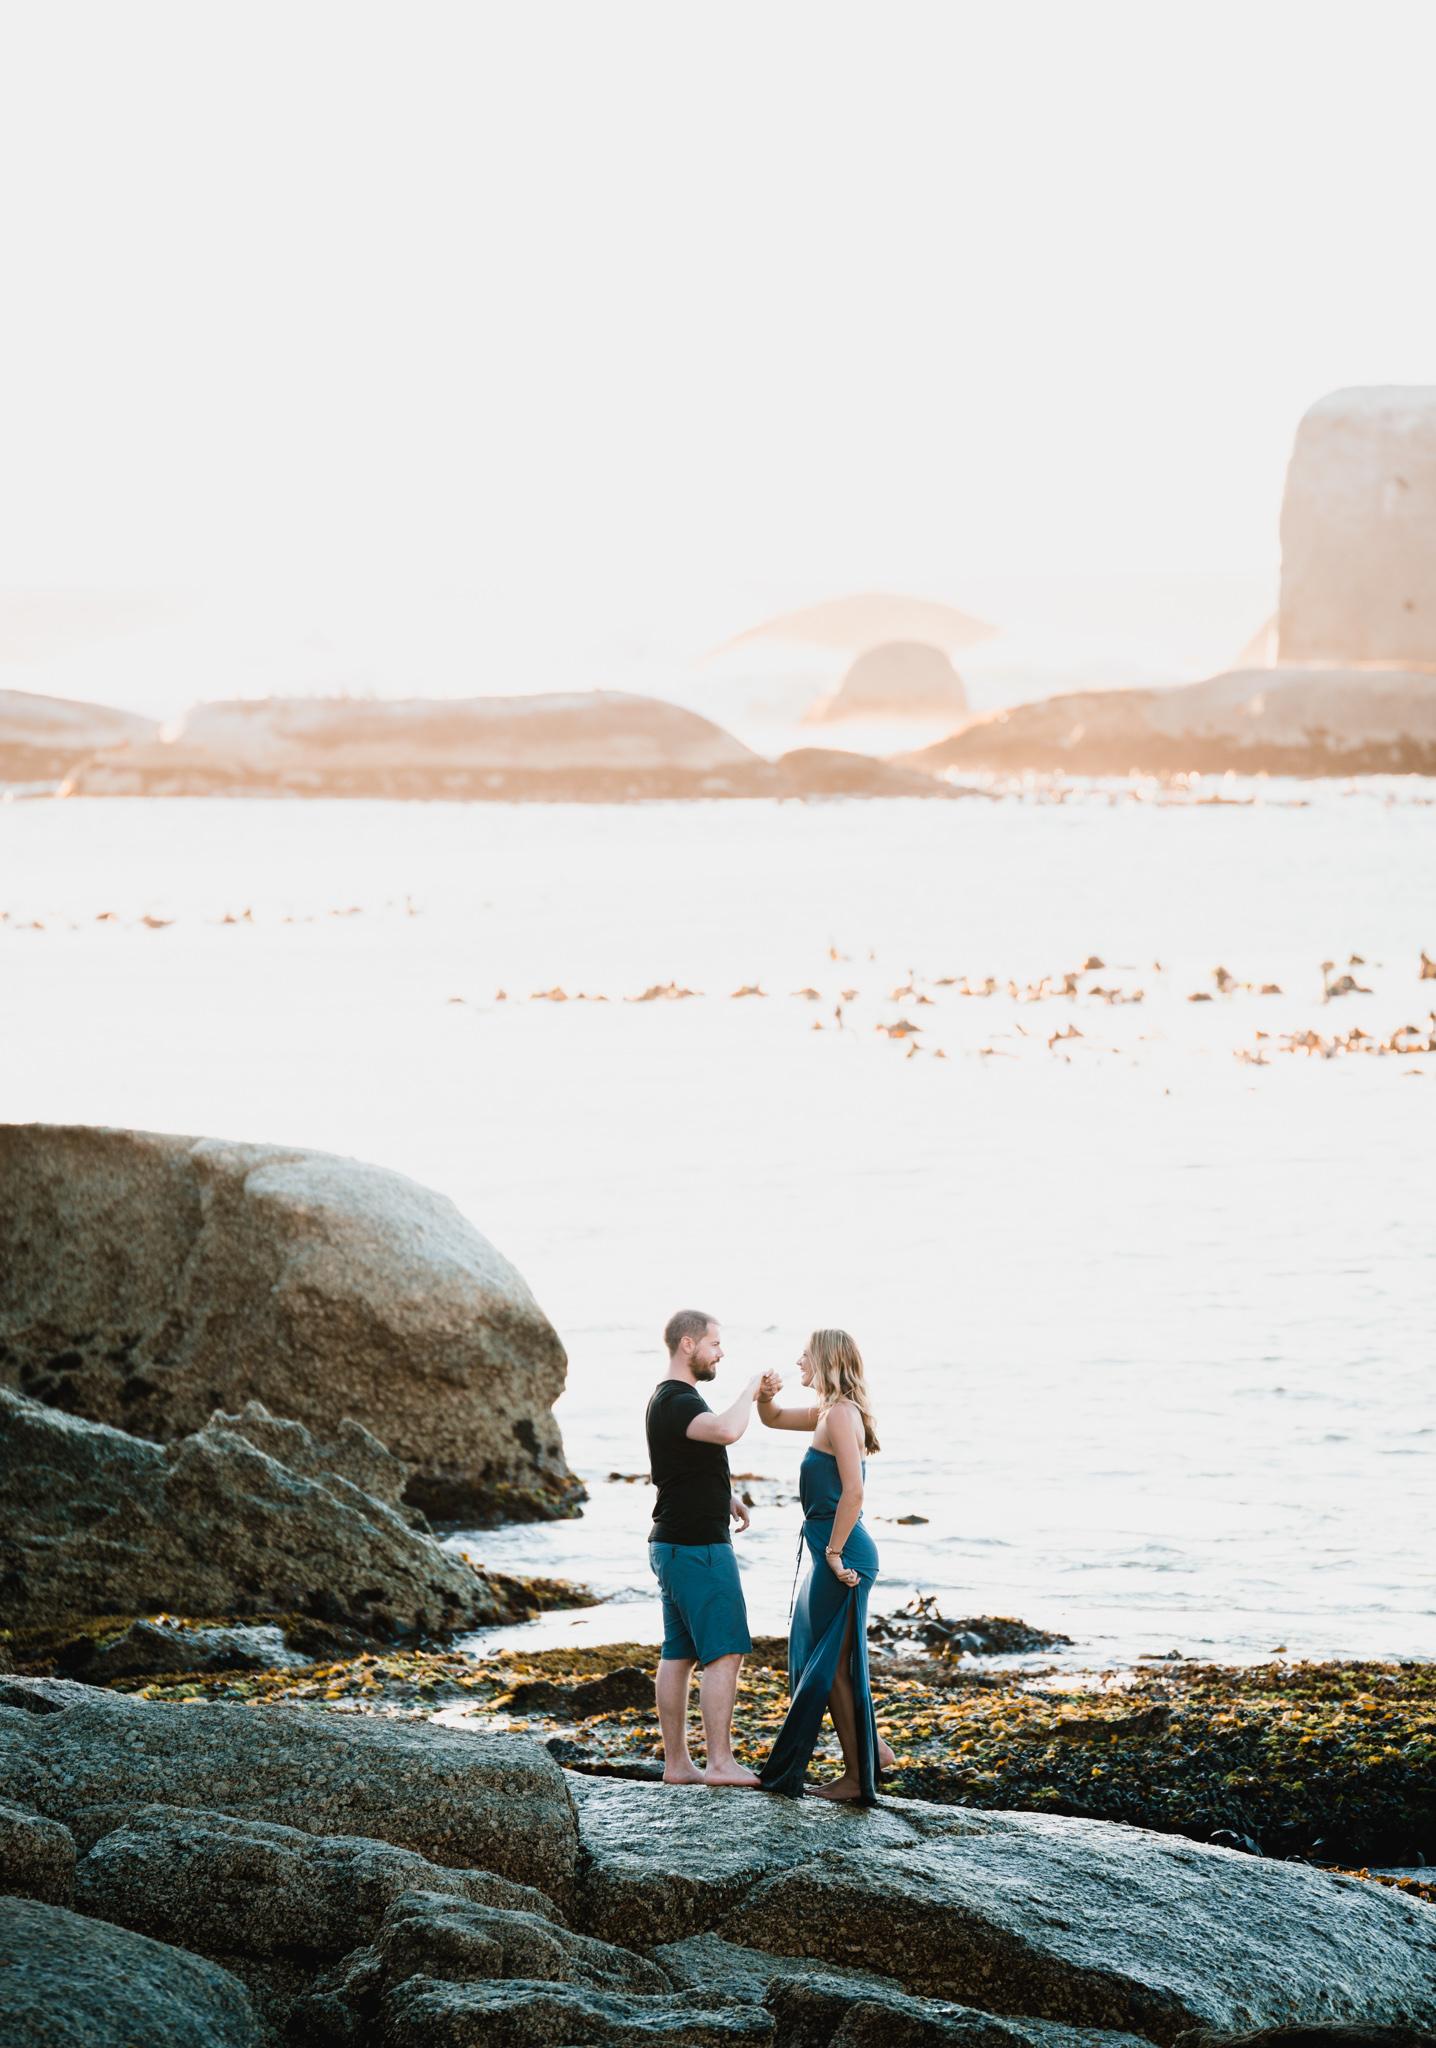 Ross & Candice engagement (152 of 166).JPG